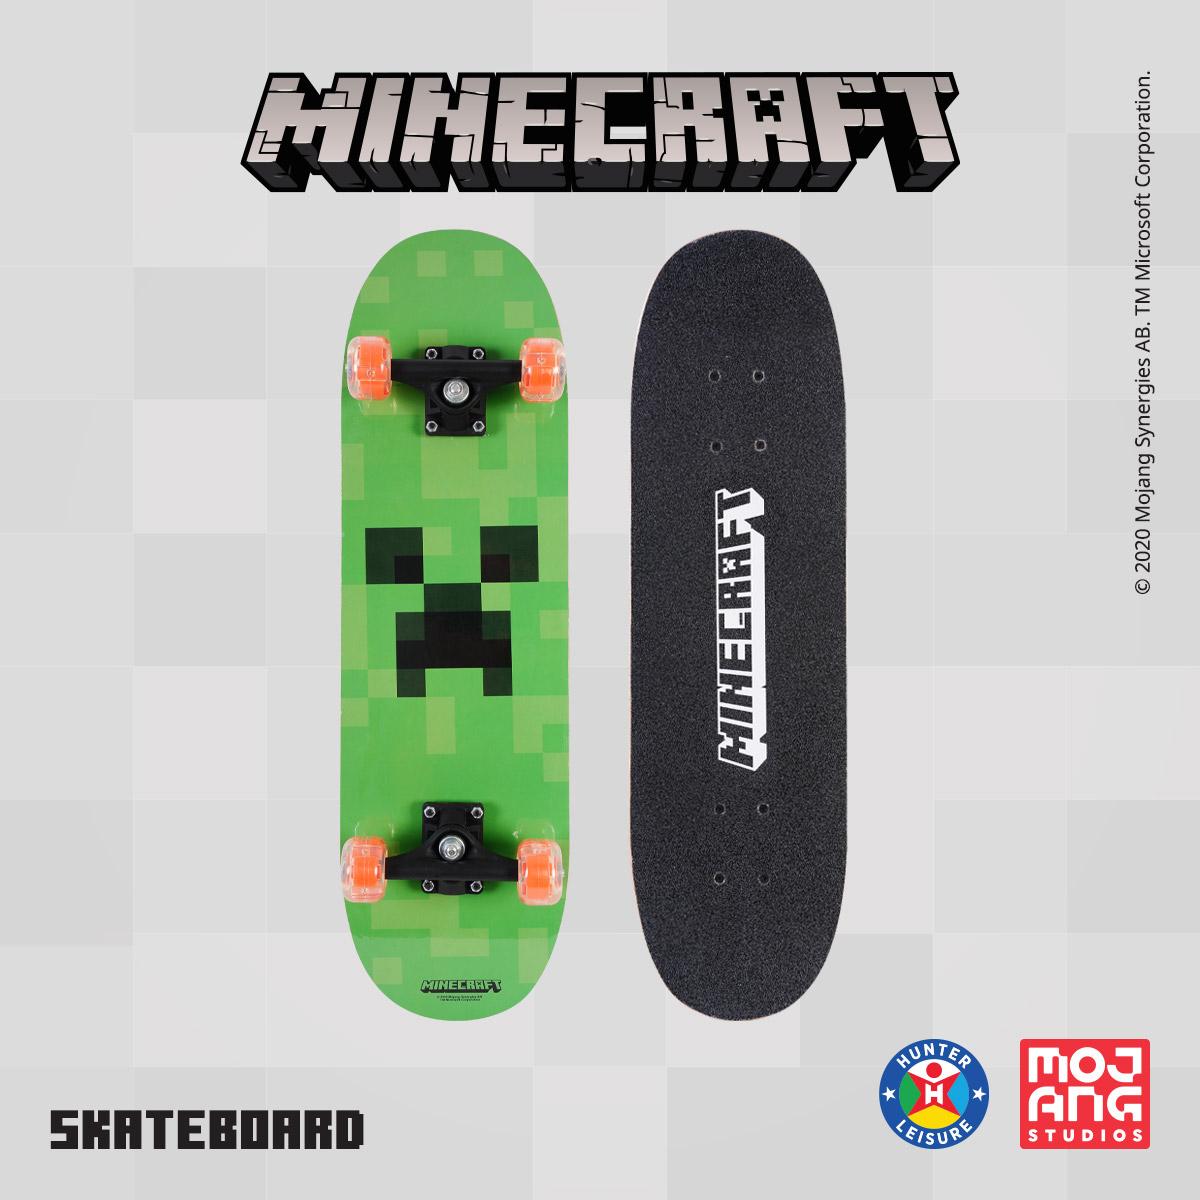 www.hunterleisure.com.au Minecraft Skateboard Big W Hunter Leisure